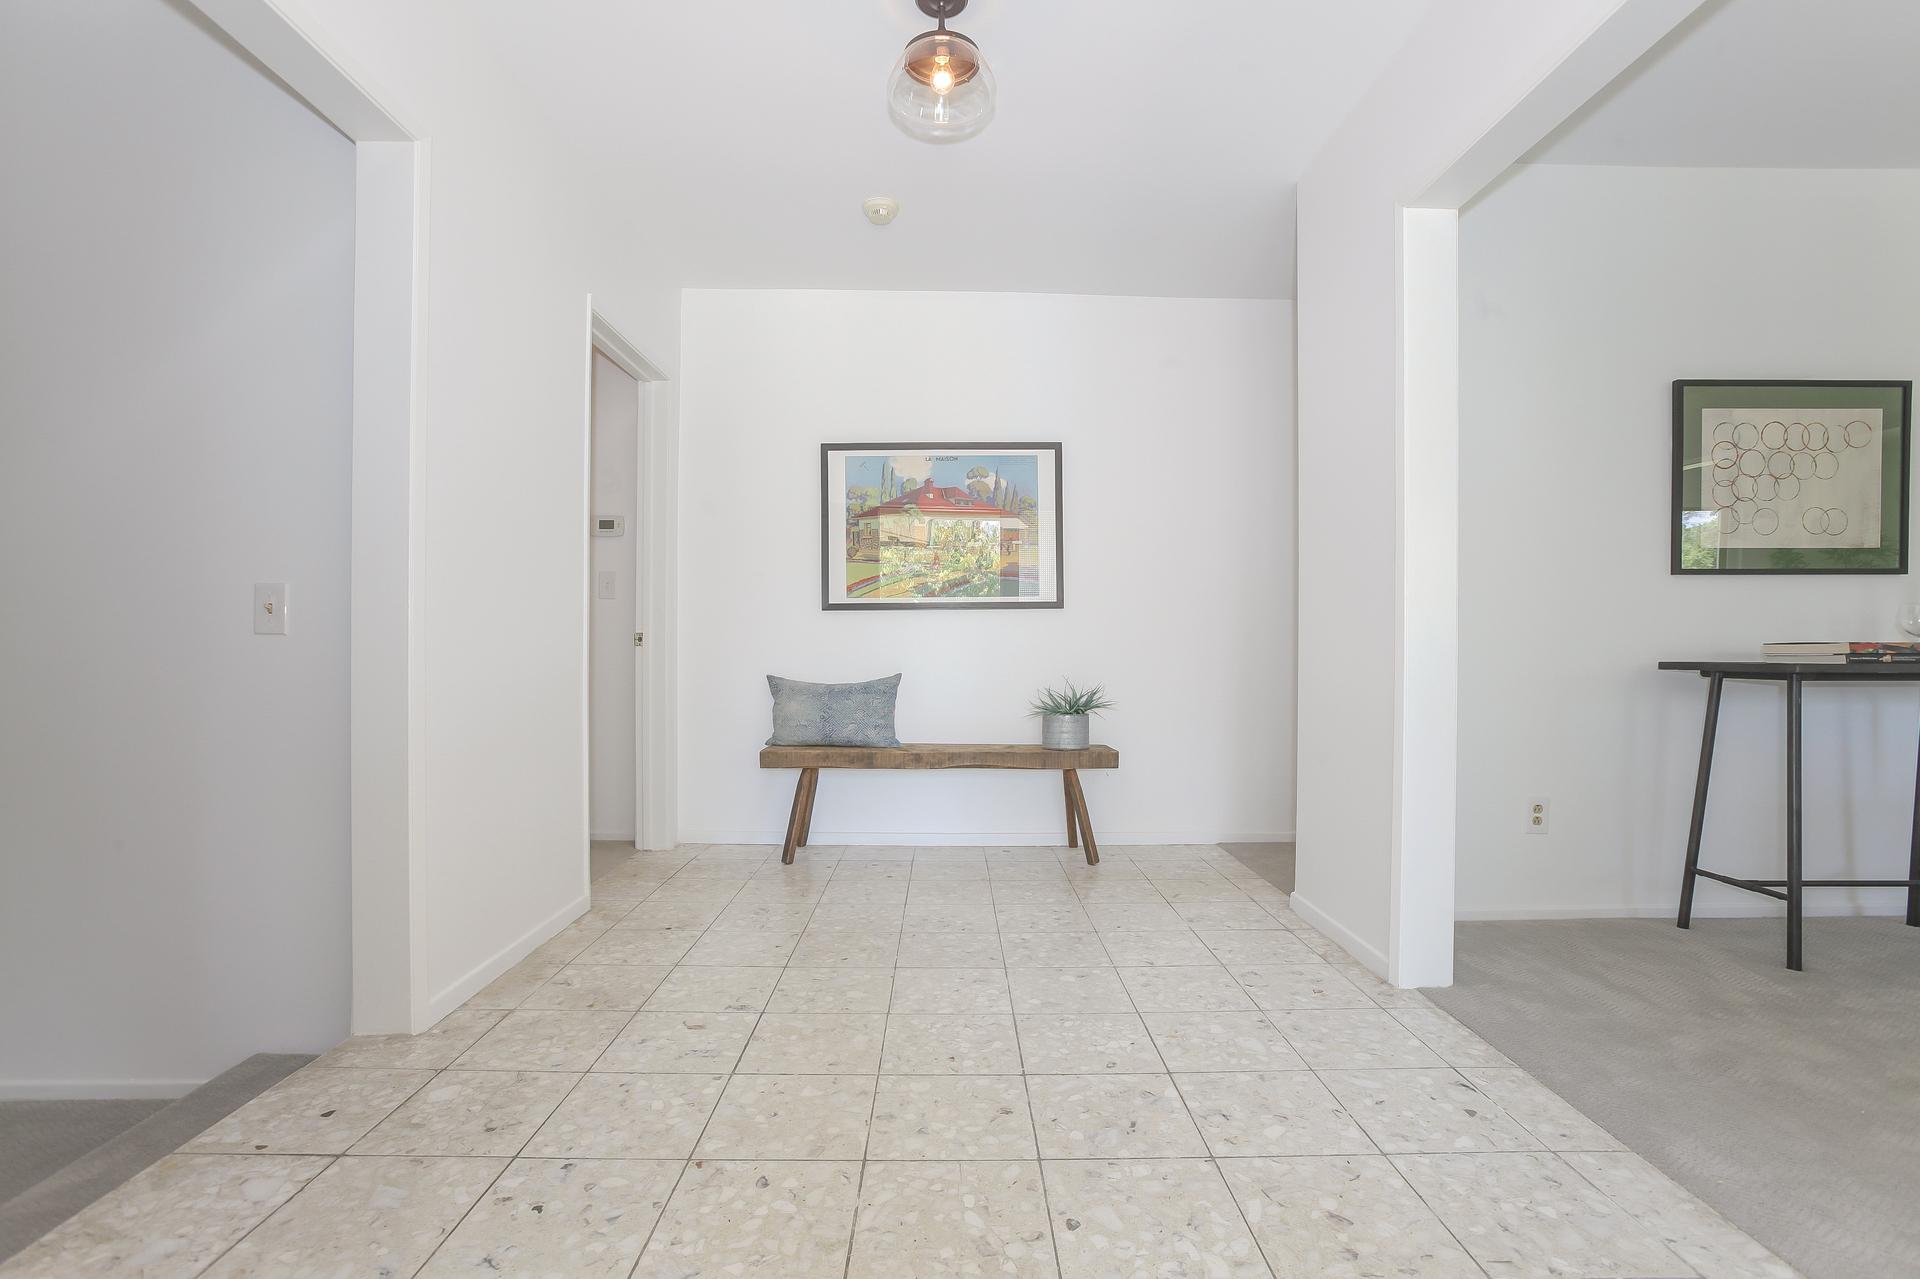 006-Foyer-4443100-medium.jpg